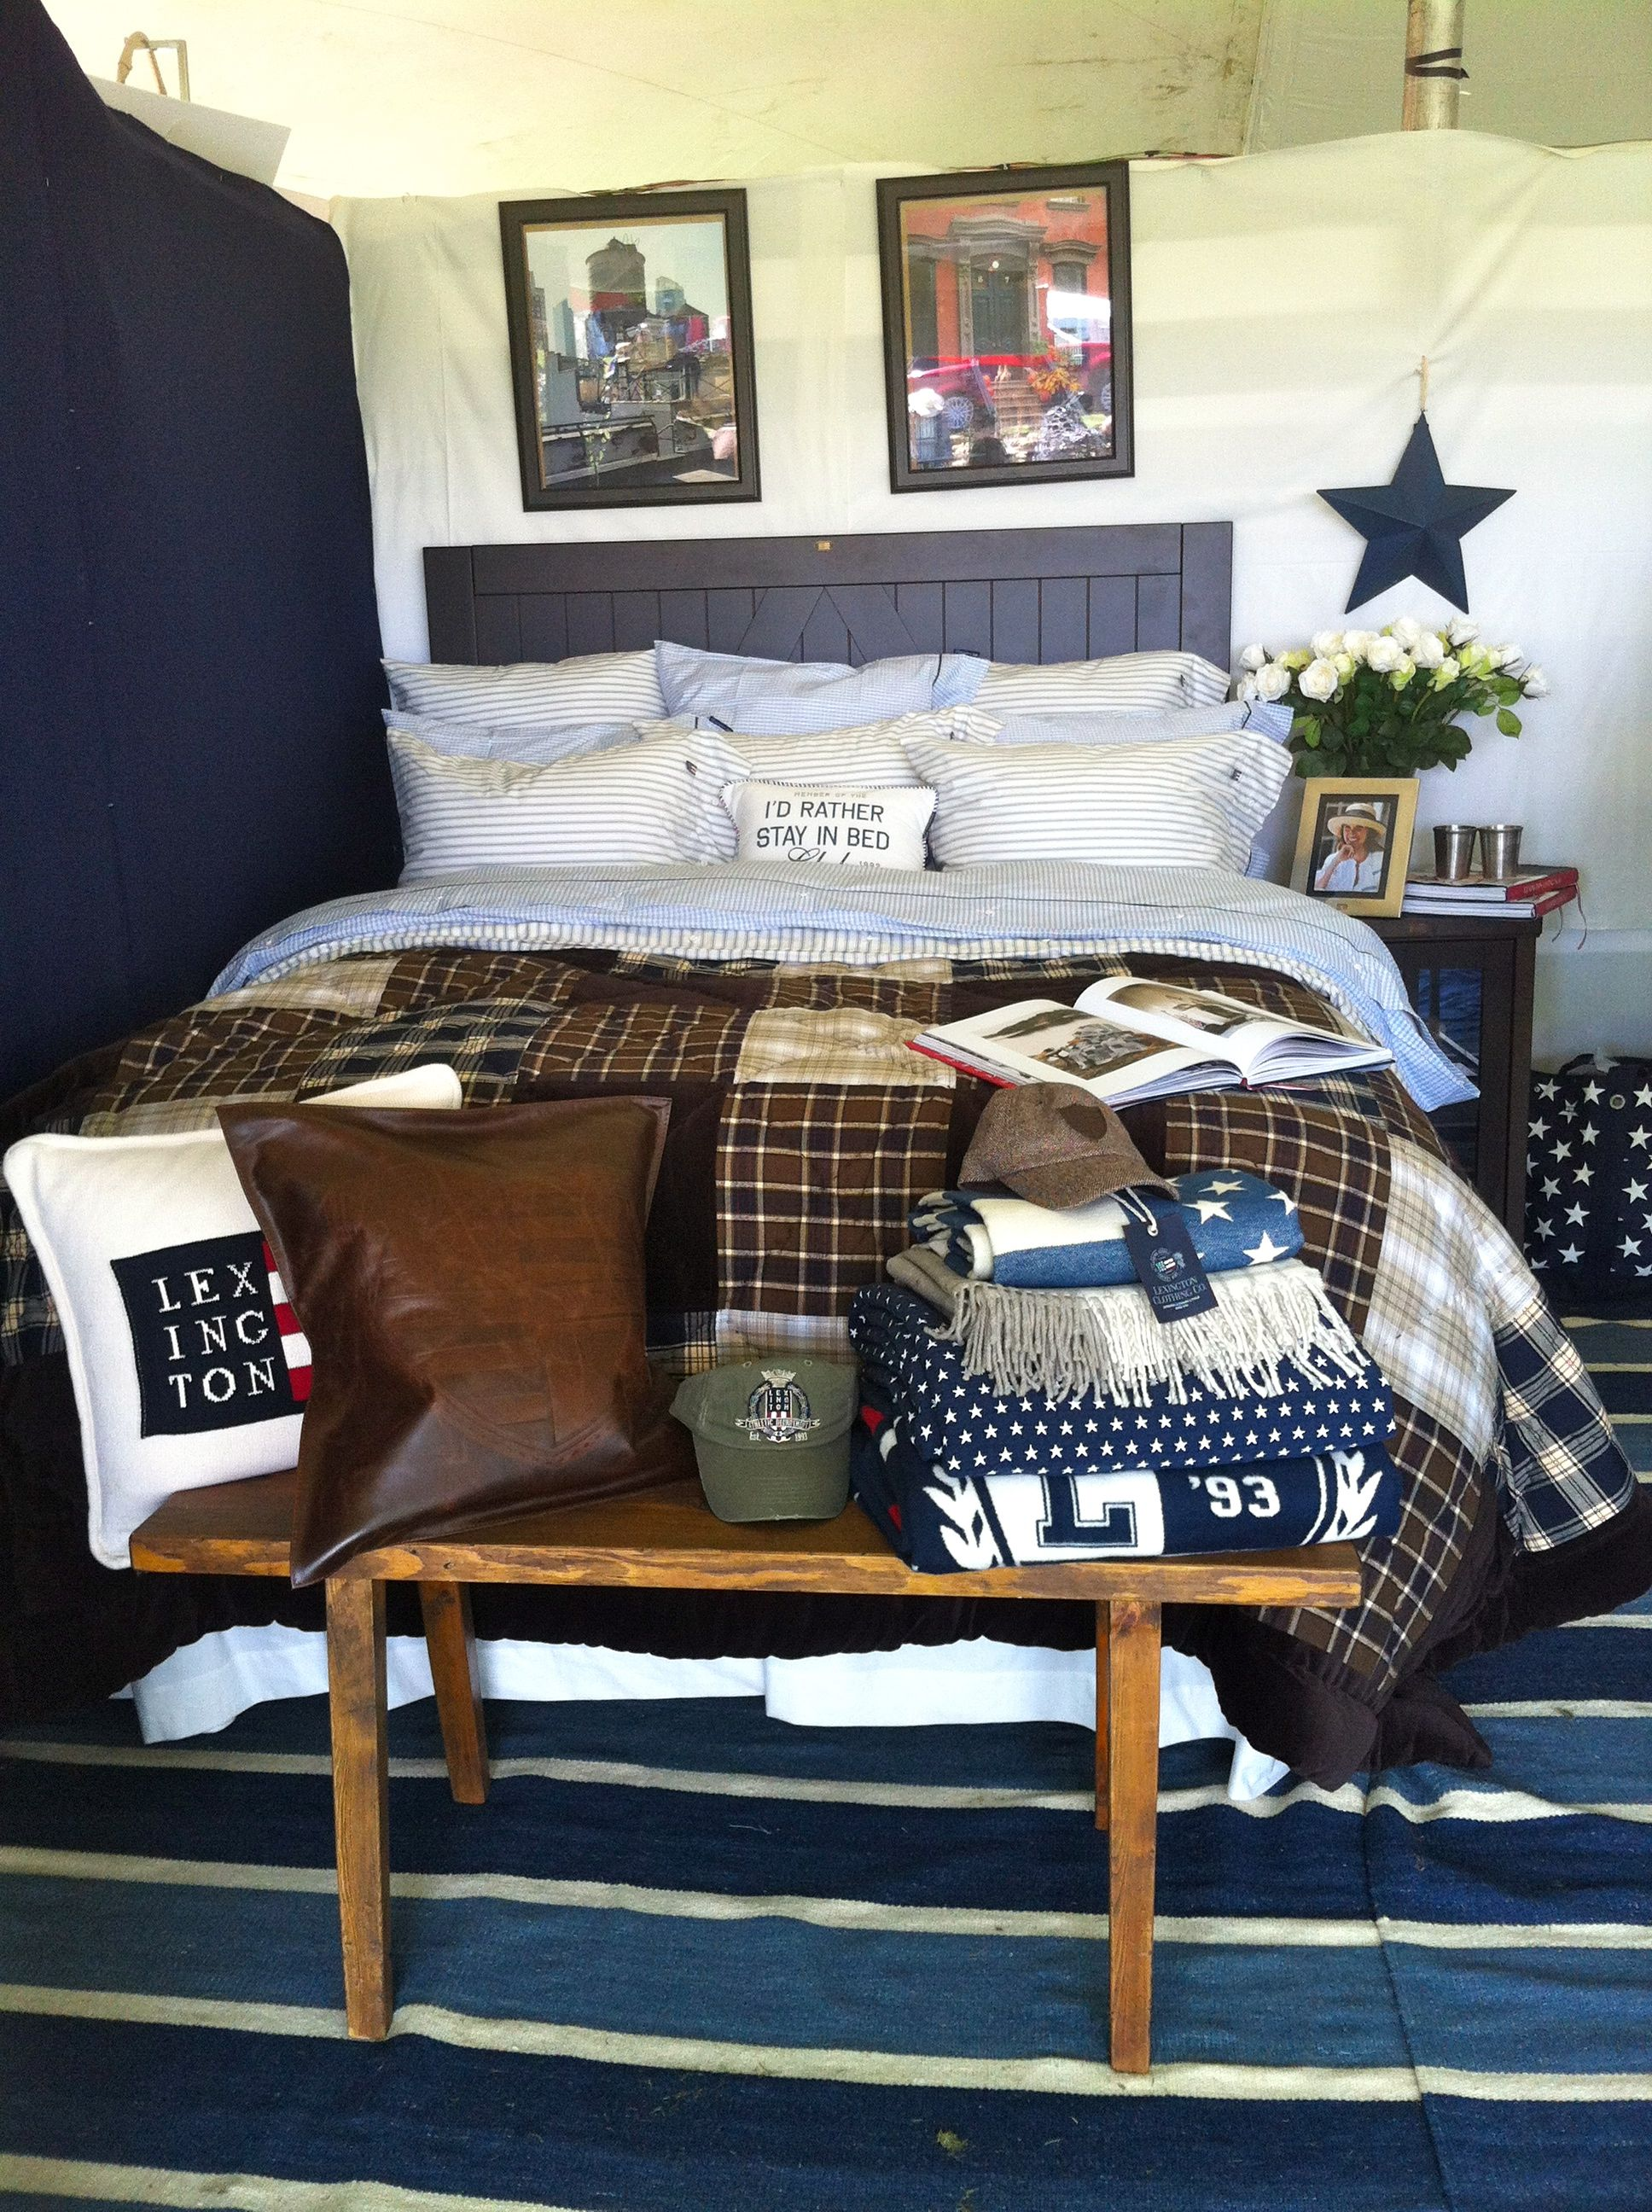 lexington   Fresh Bedrooms   Pinterest   Bedrooms, Room and